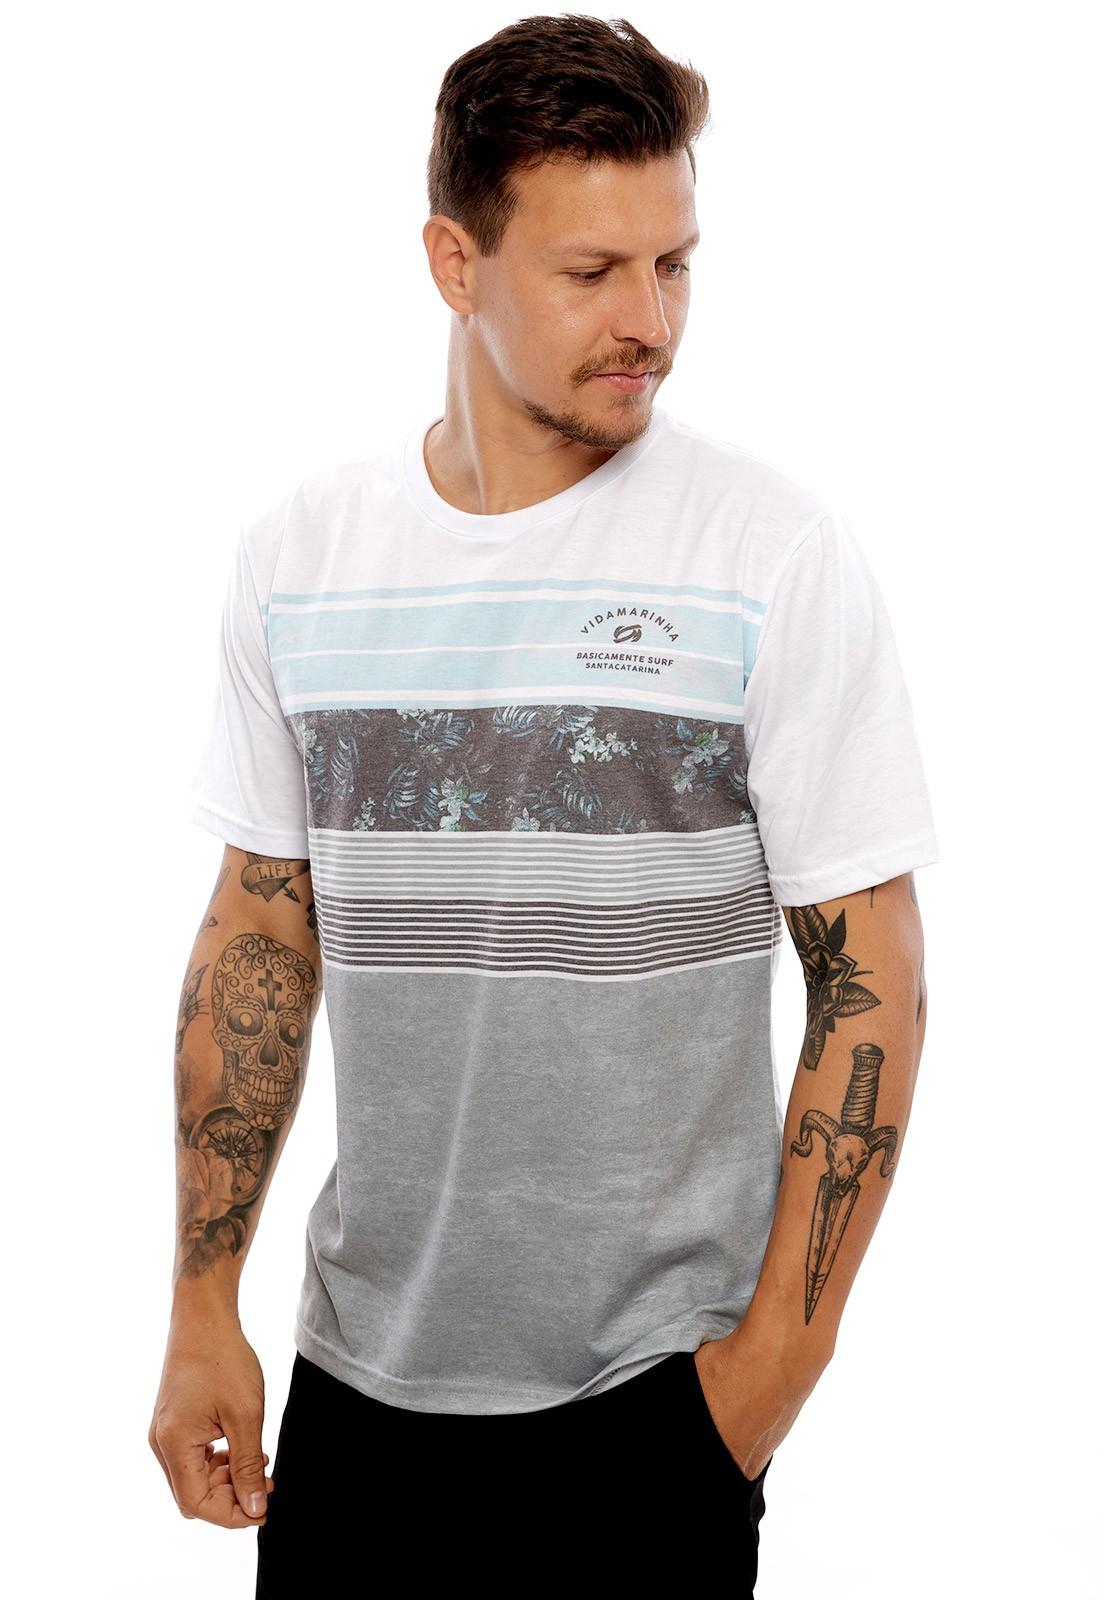 Camiseta Vida Marinha Manga Curta Branco/Cinza